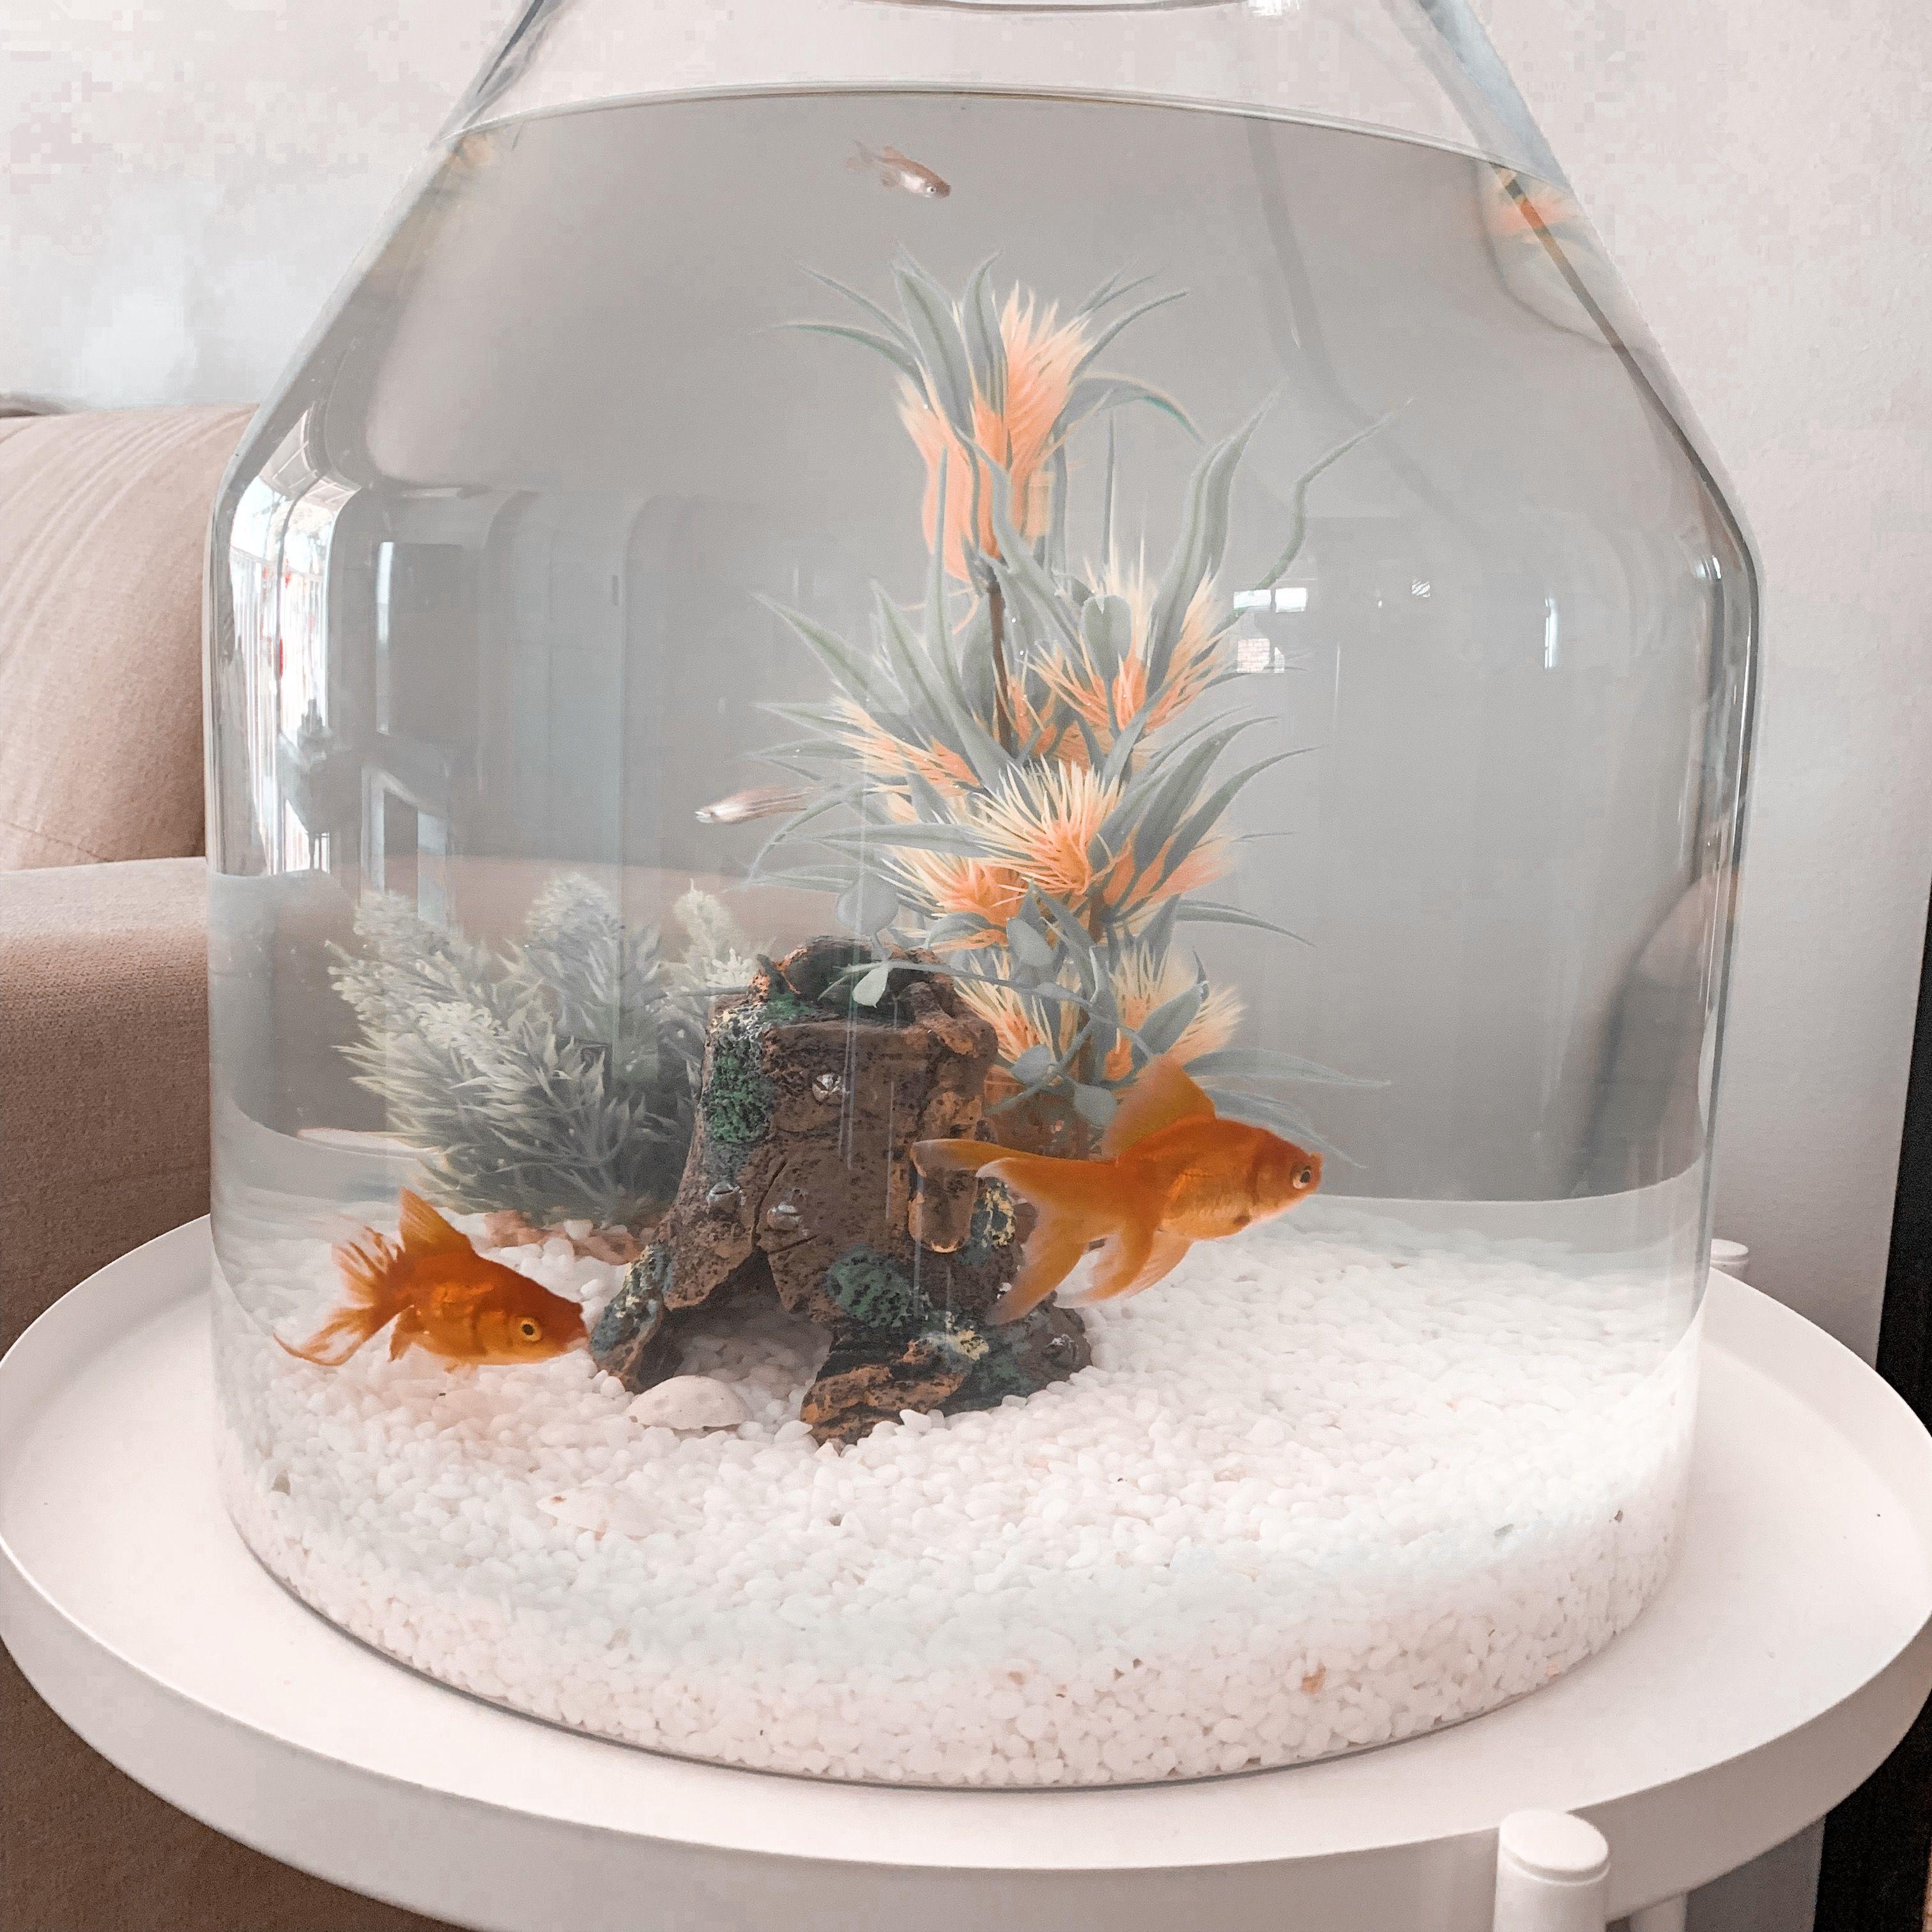 Fish Bowl Small Fish Tanks Fish Bowl Betta Fish Bowl